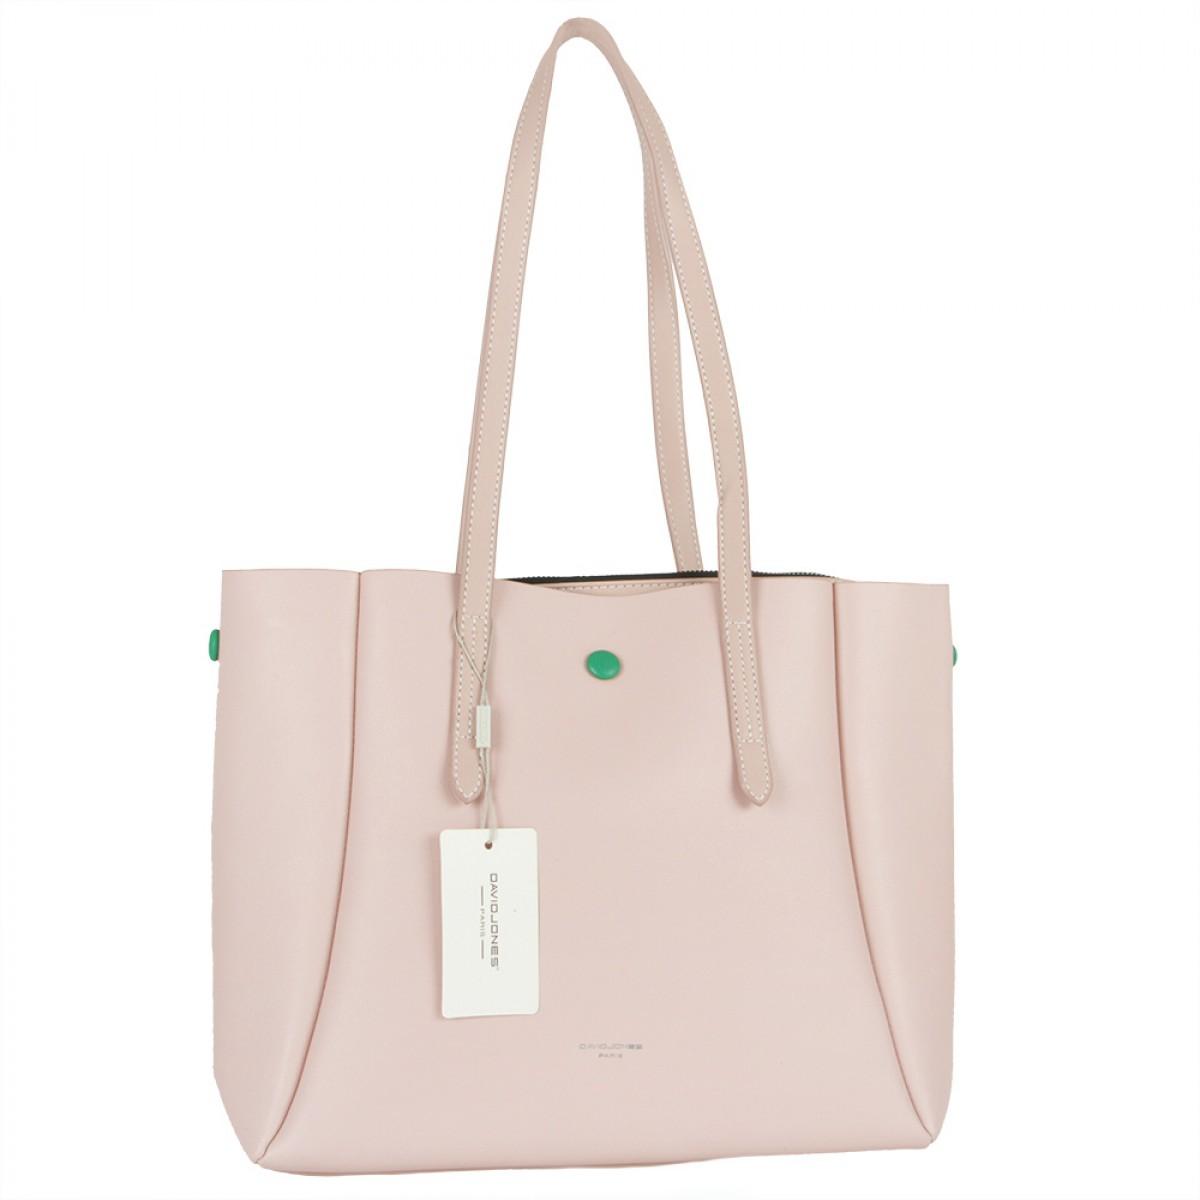 Жіноча сумка David Jones 5991-2 PINK